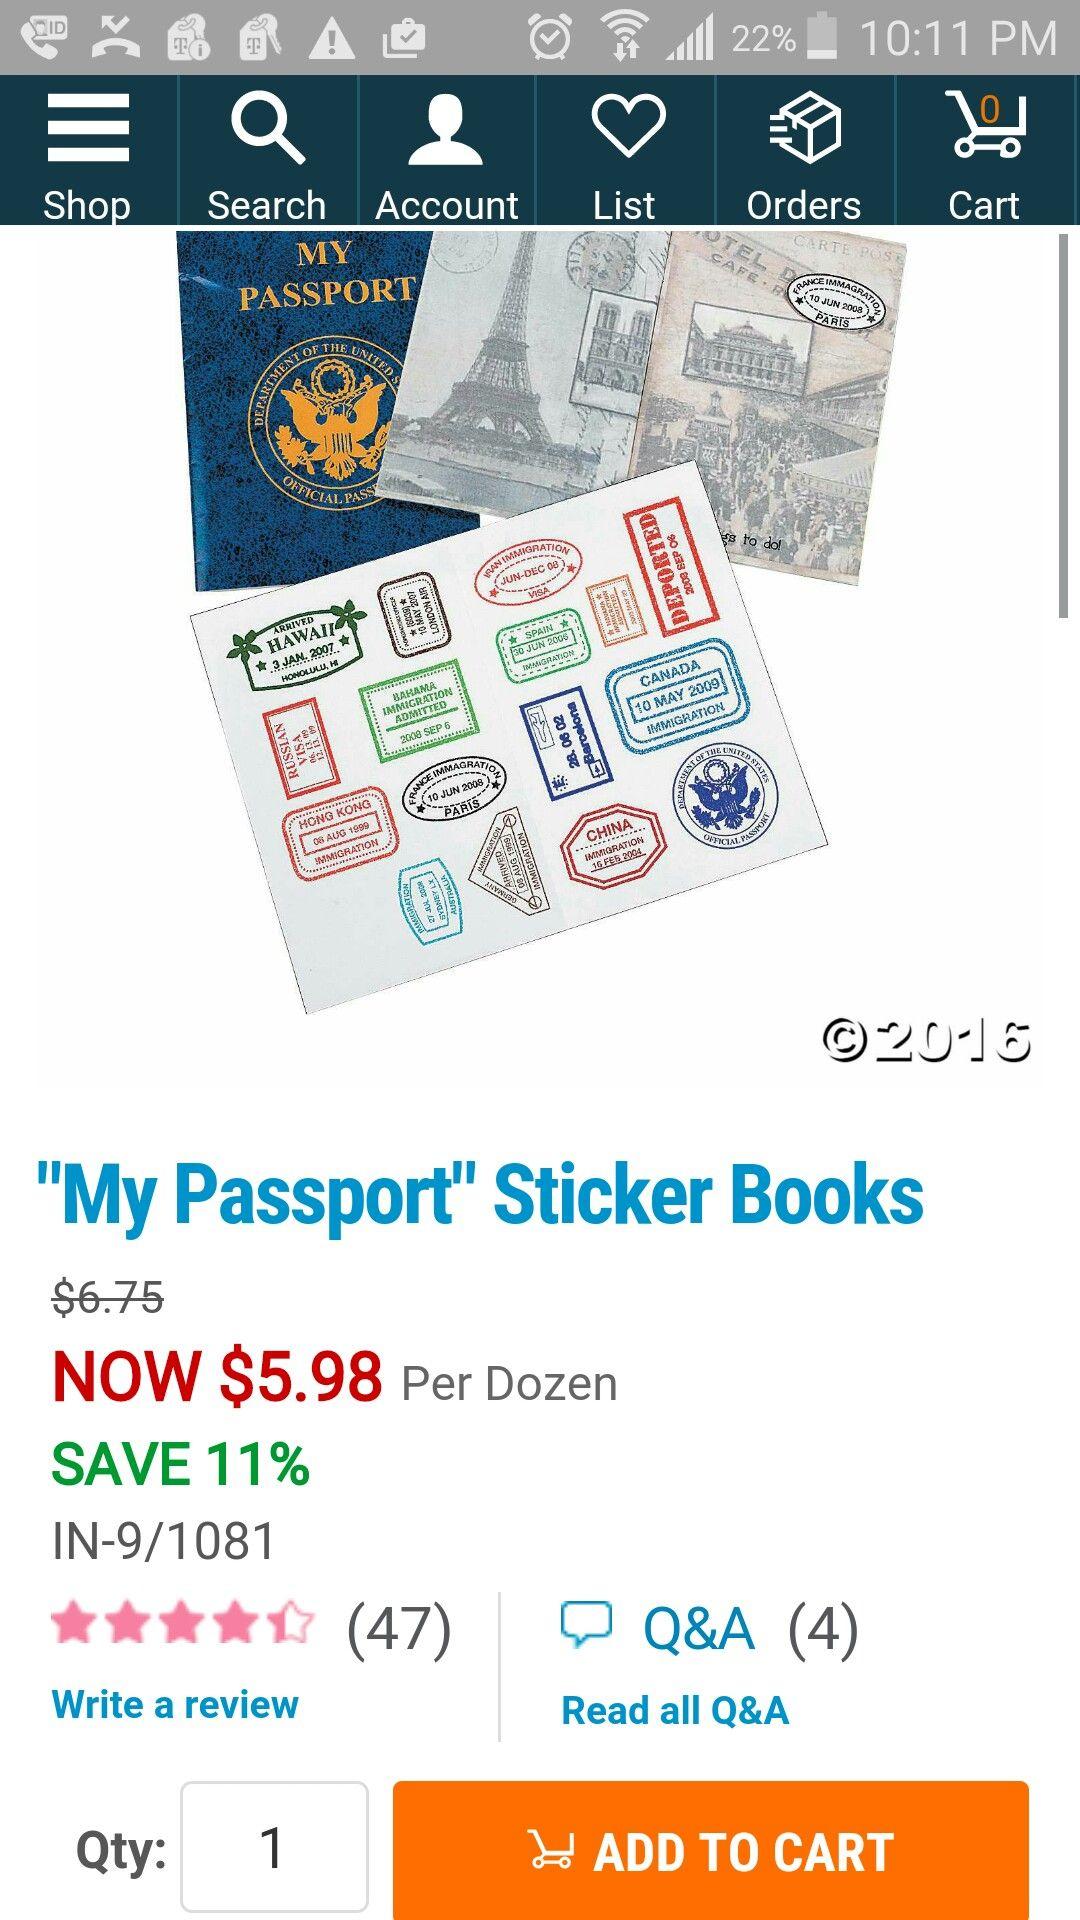 Passport sticker books